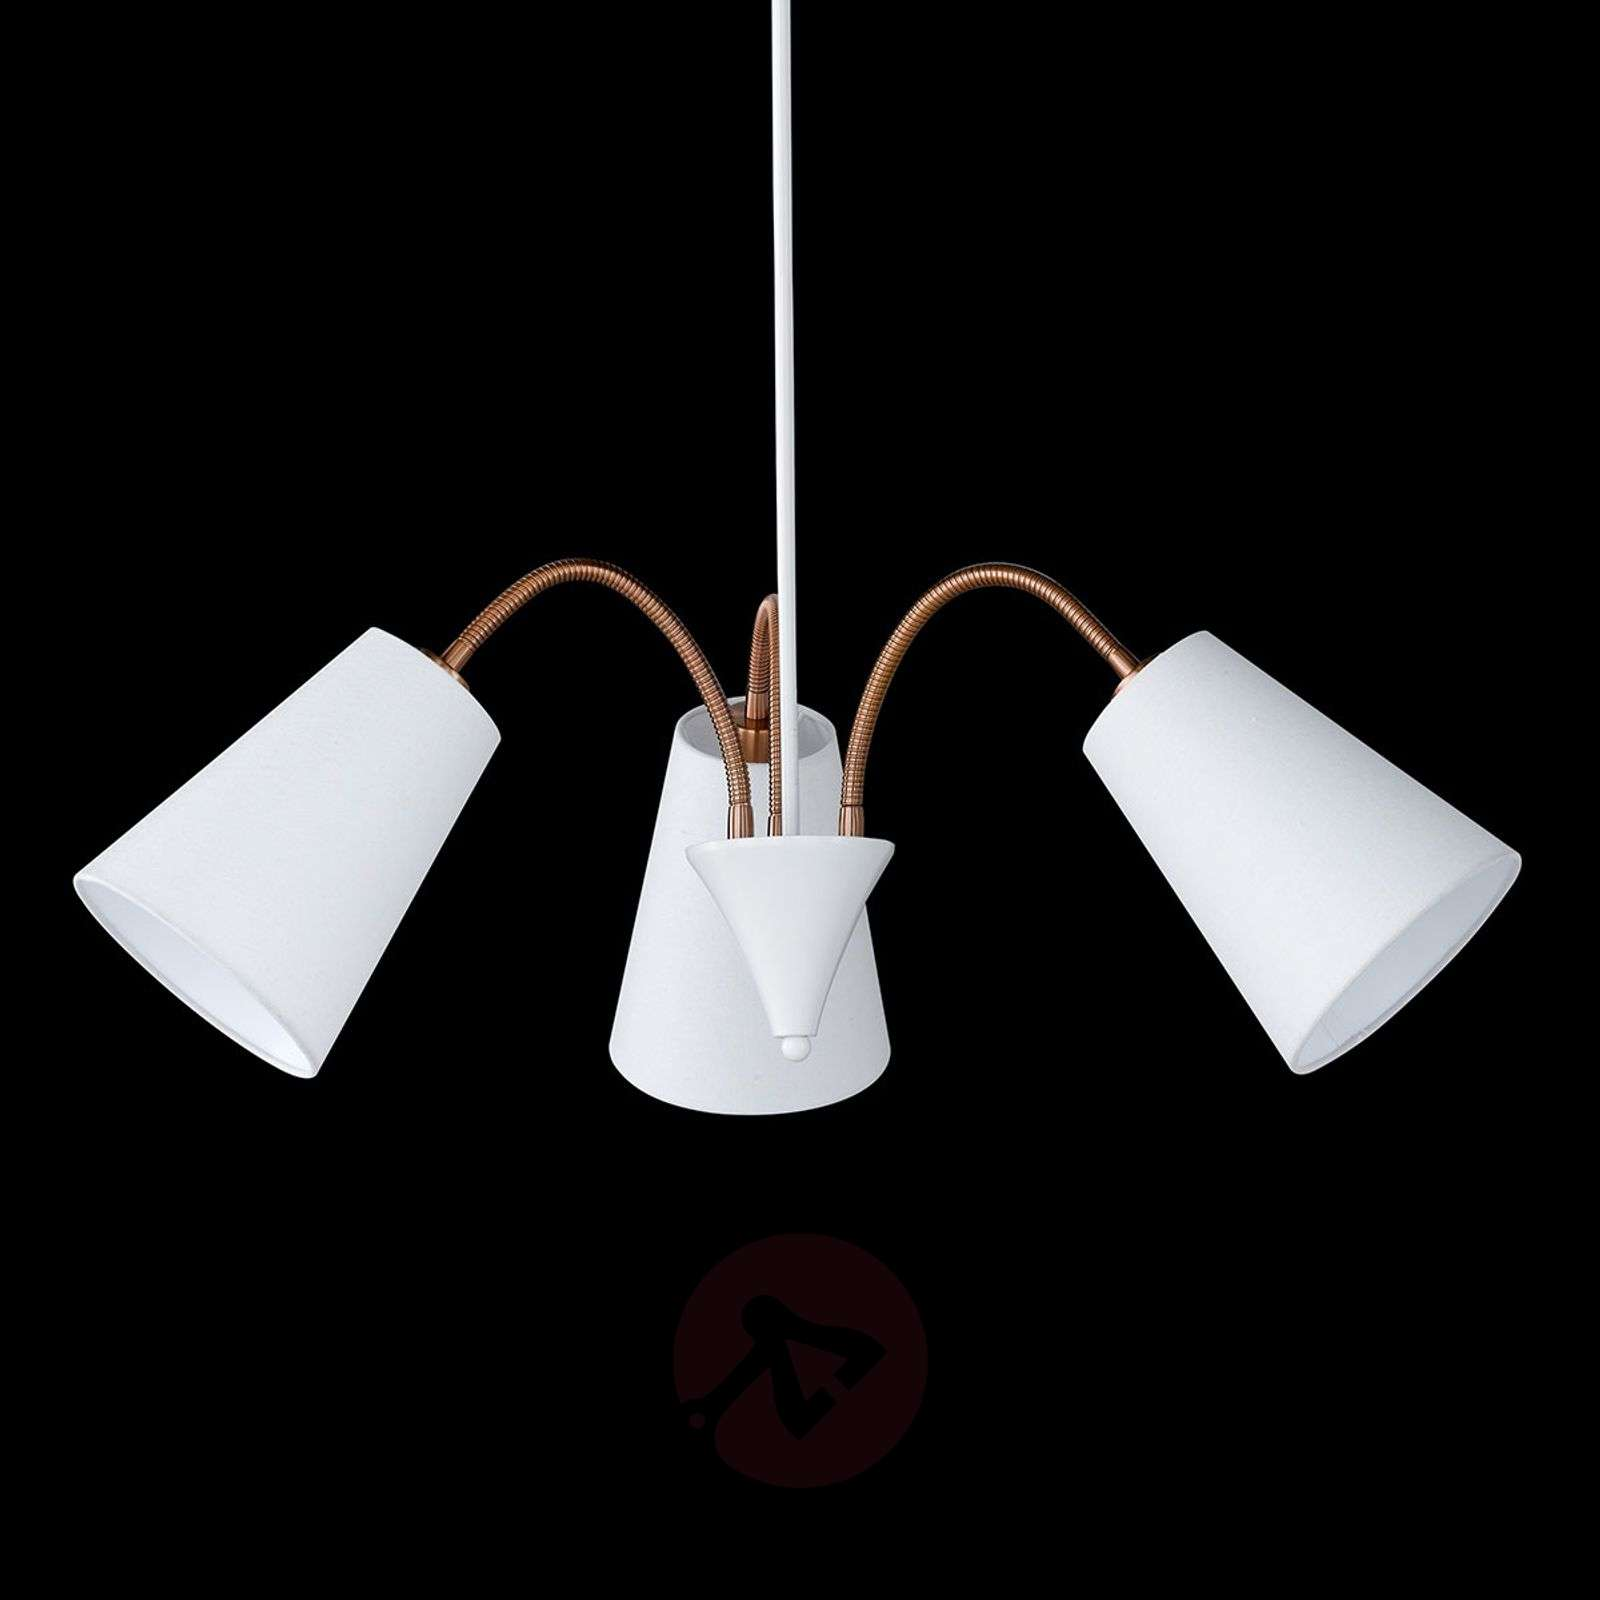 Three-bulb pendant light Hopper adjustable-4581562-01